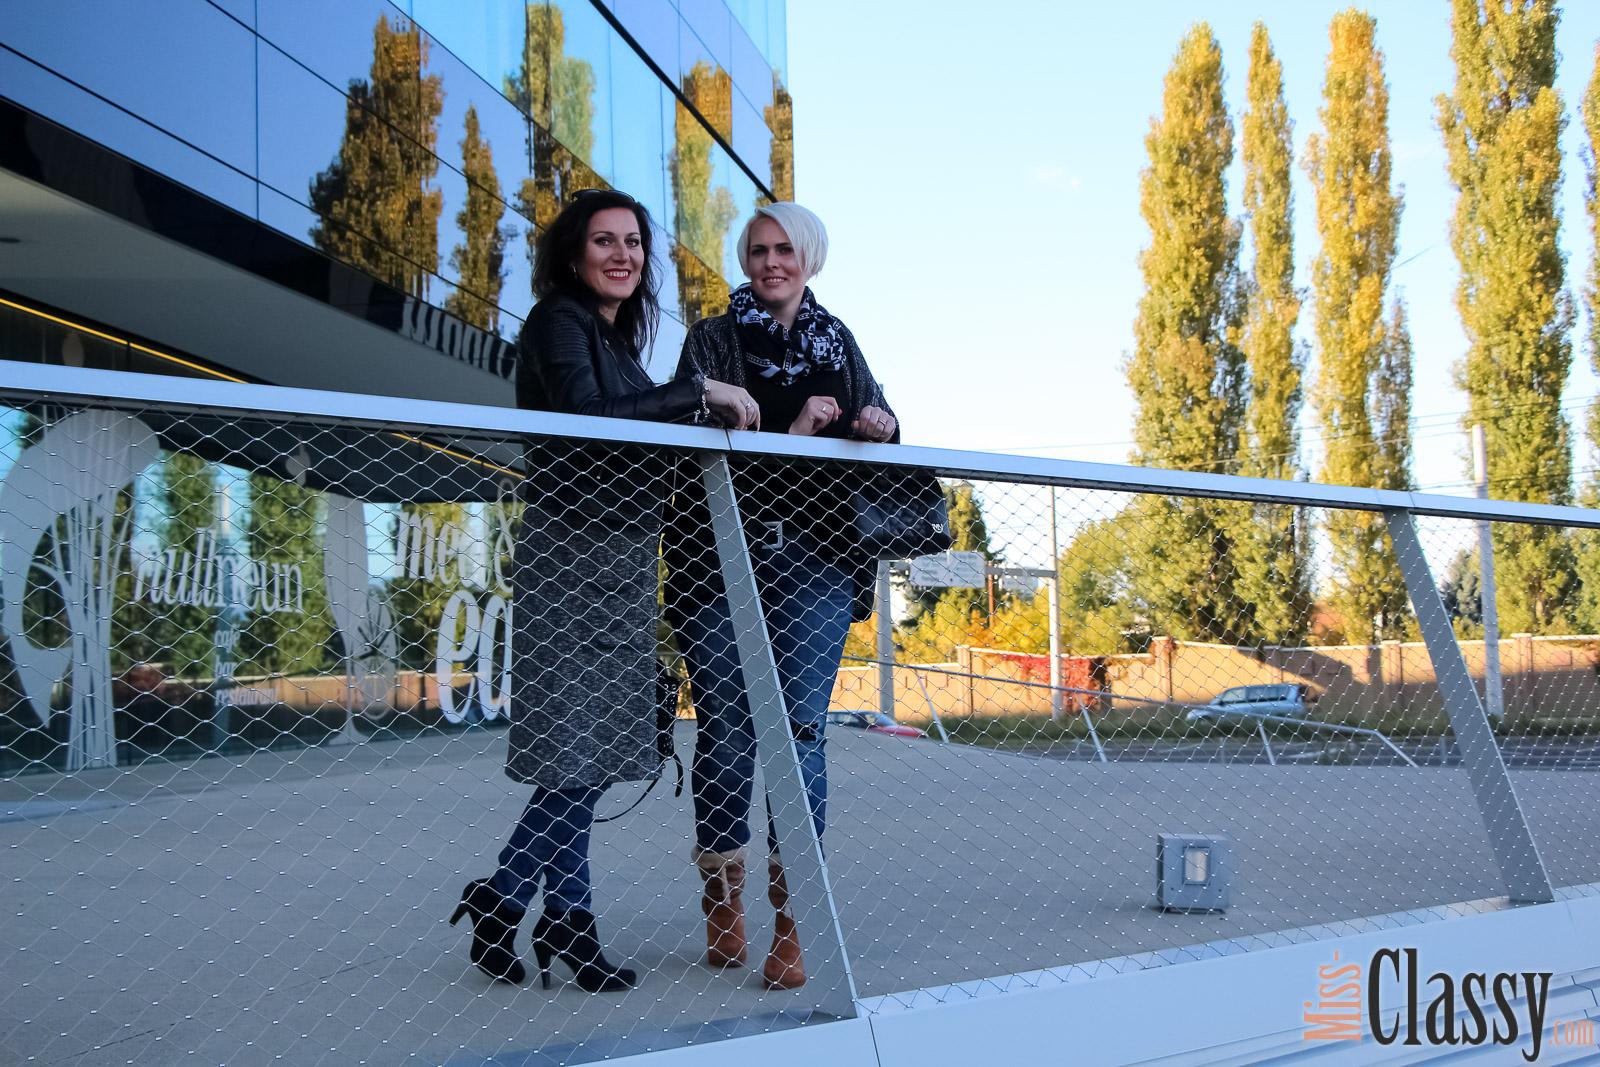 OUTFIT Layering - Longcardigan und Lederjacke, Graz, Steiermark, Miss Classy, miss-classy.com, Herbst, Doris & Babs, Sonnenbrille, Burberry, Vogue, Michael Kors